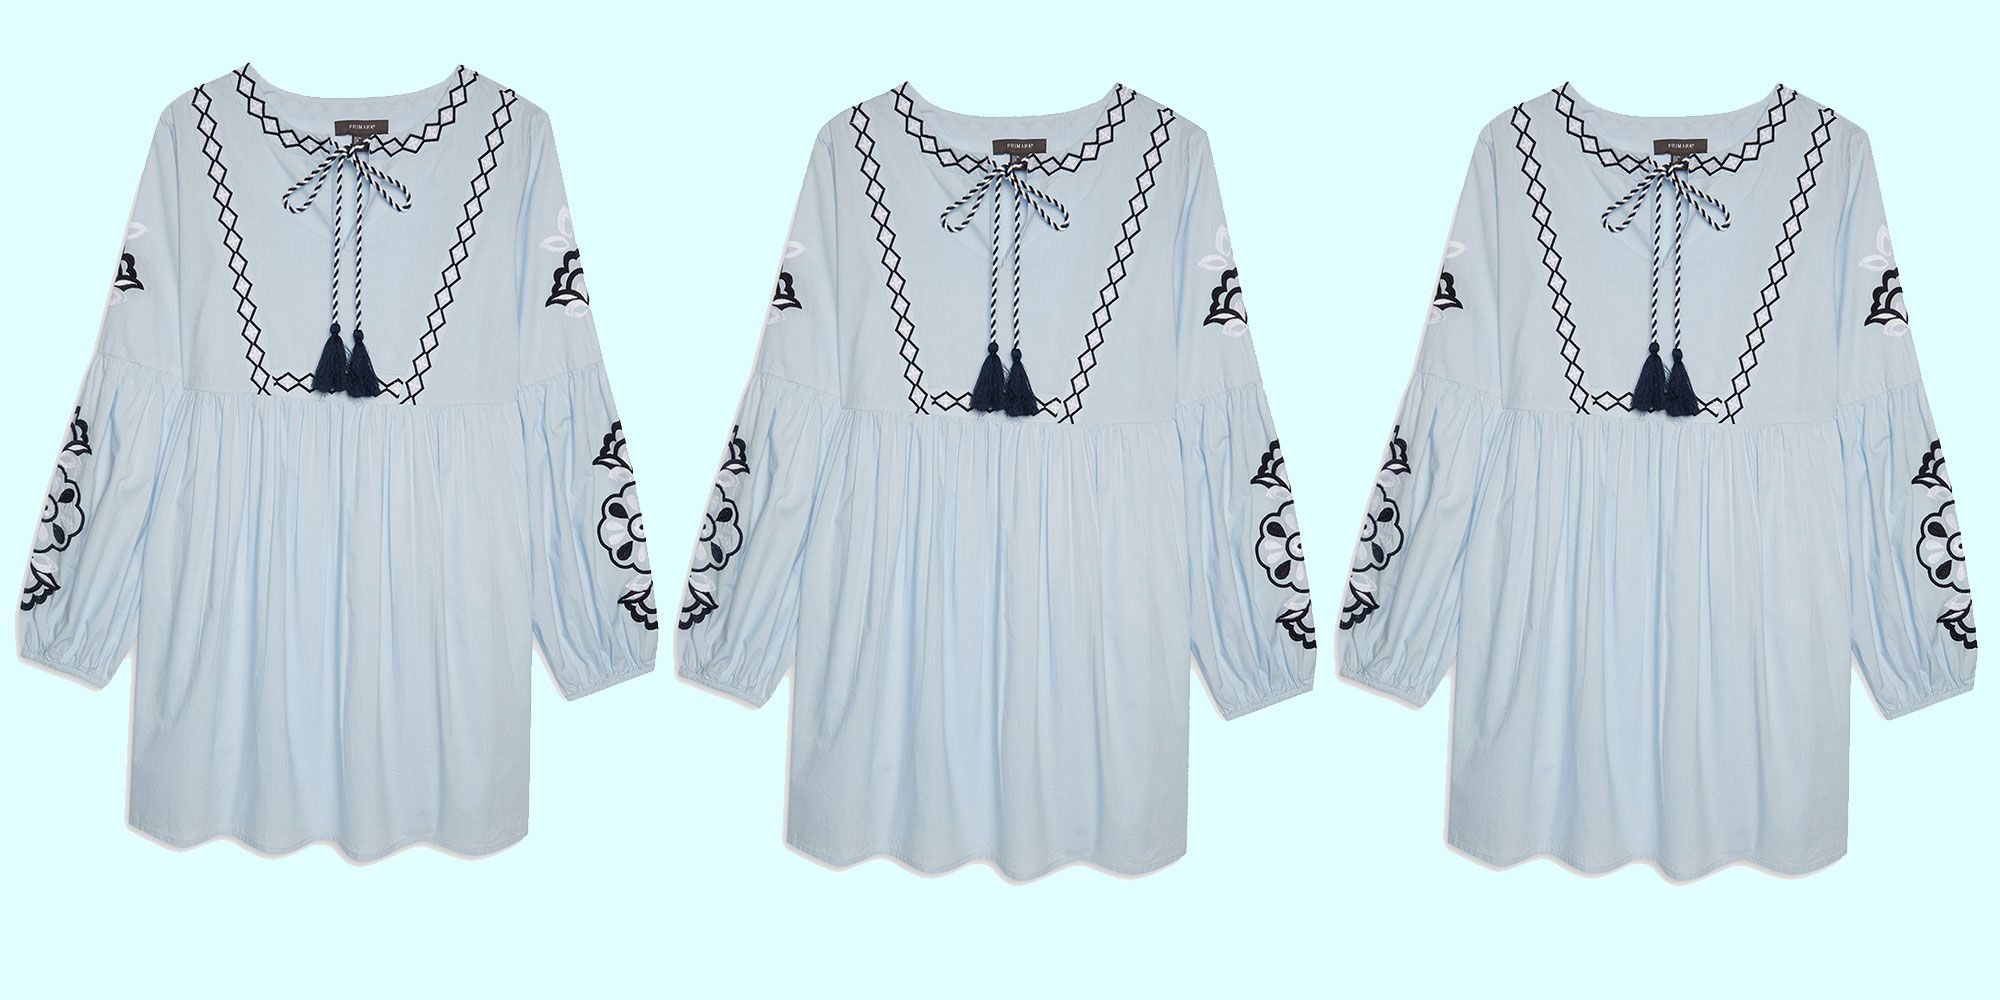 Primark summer dresses